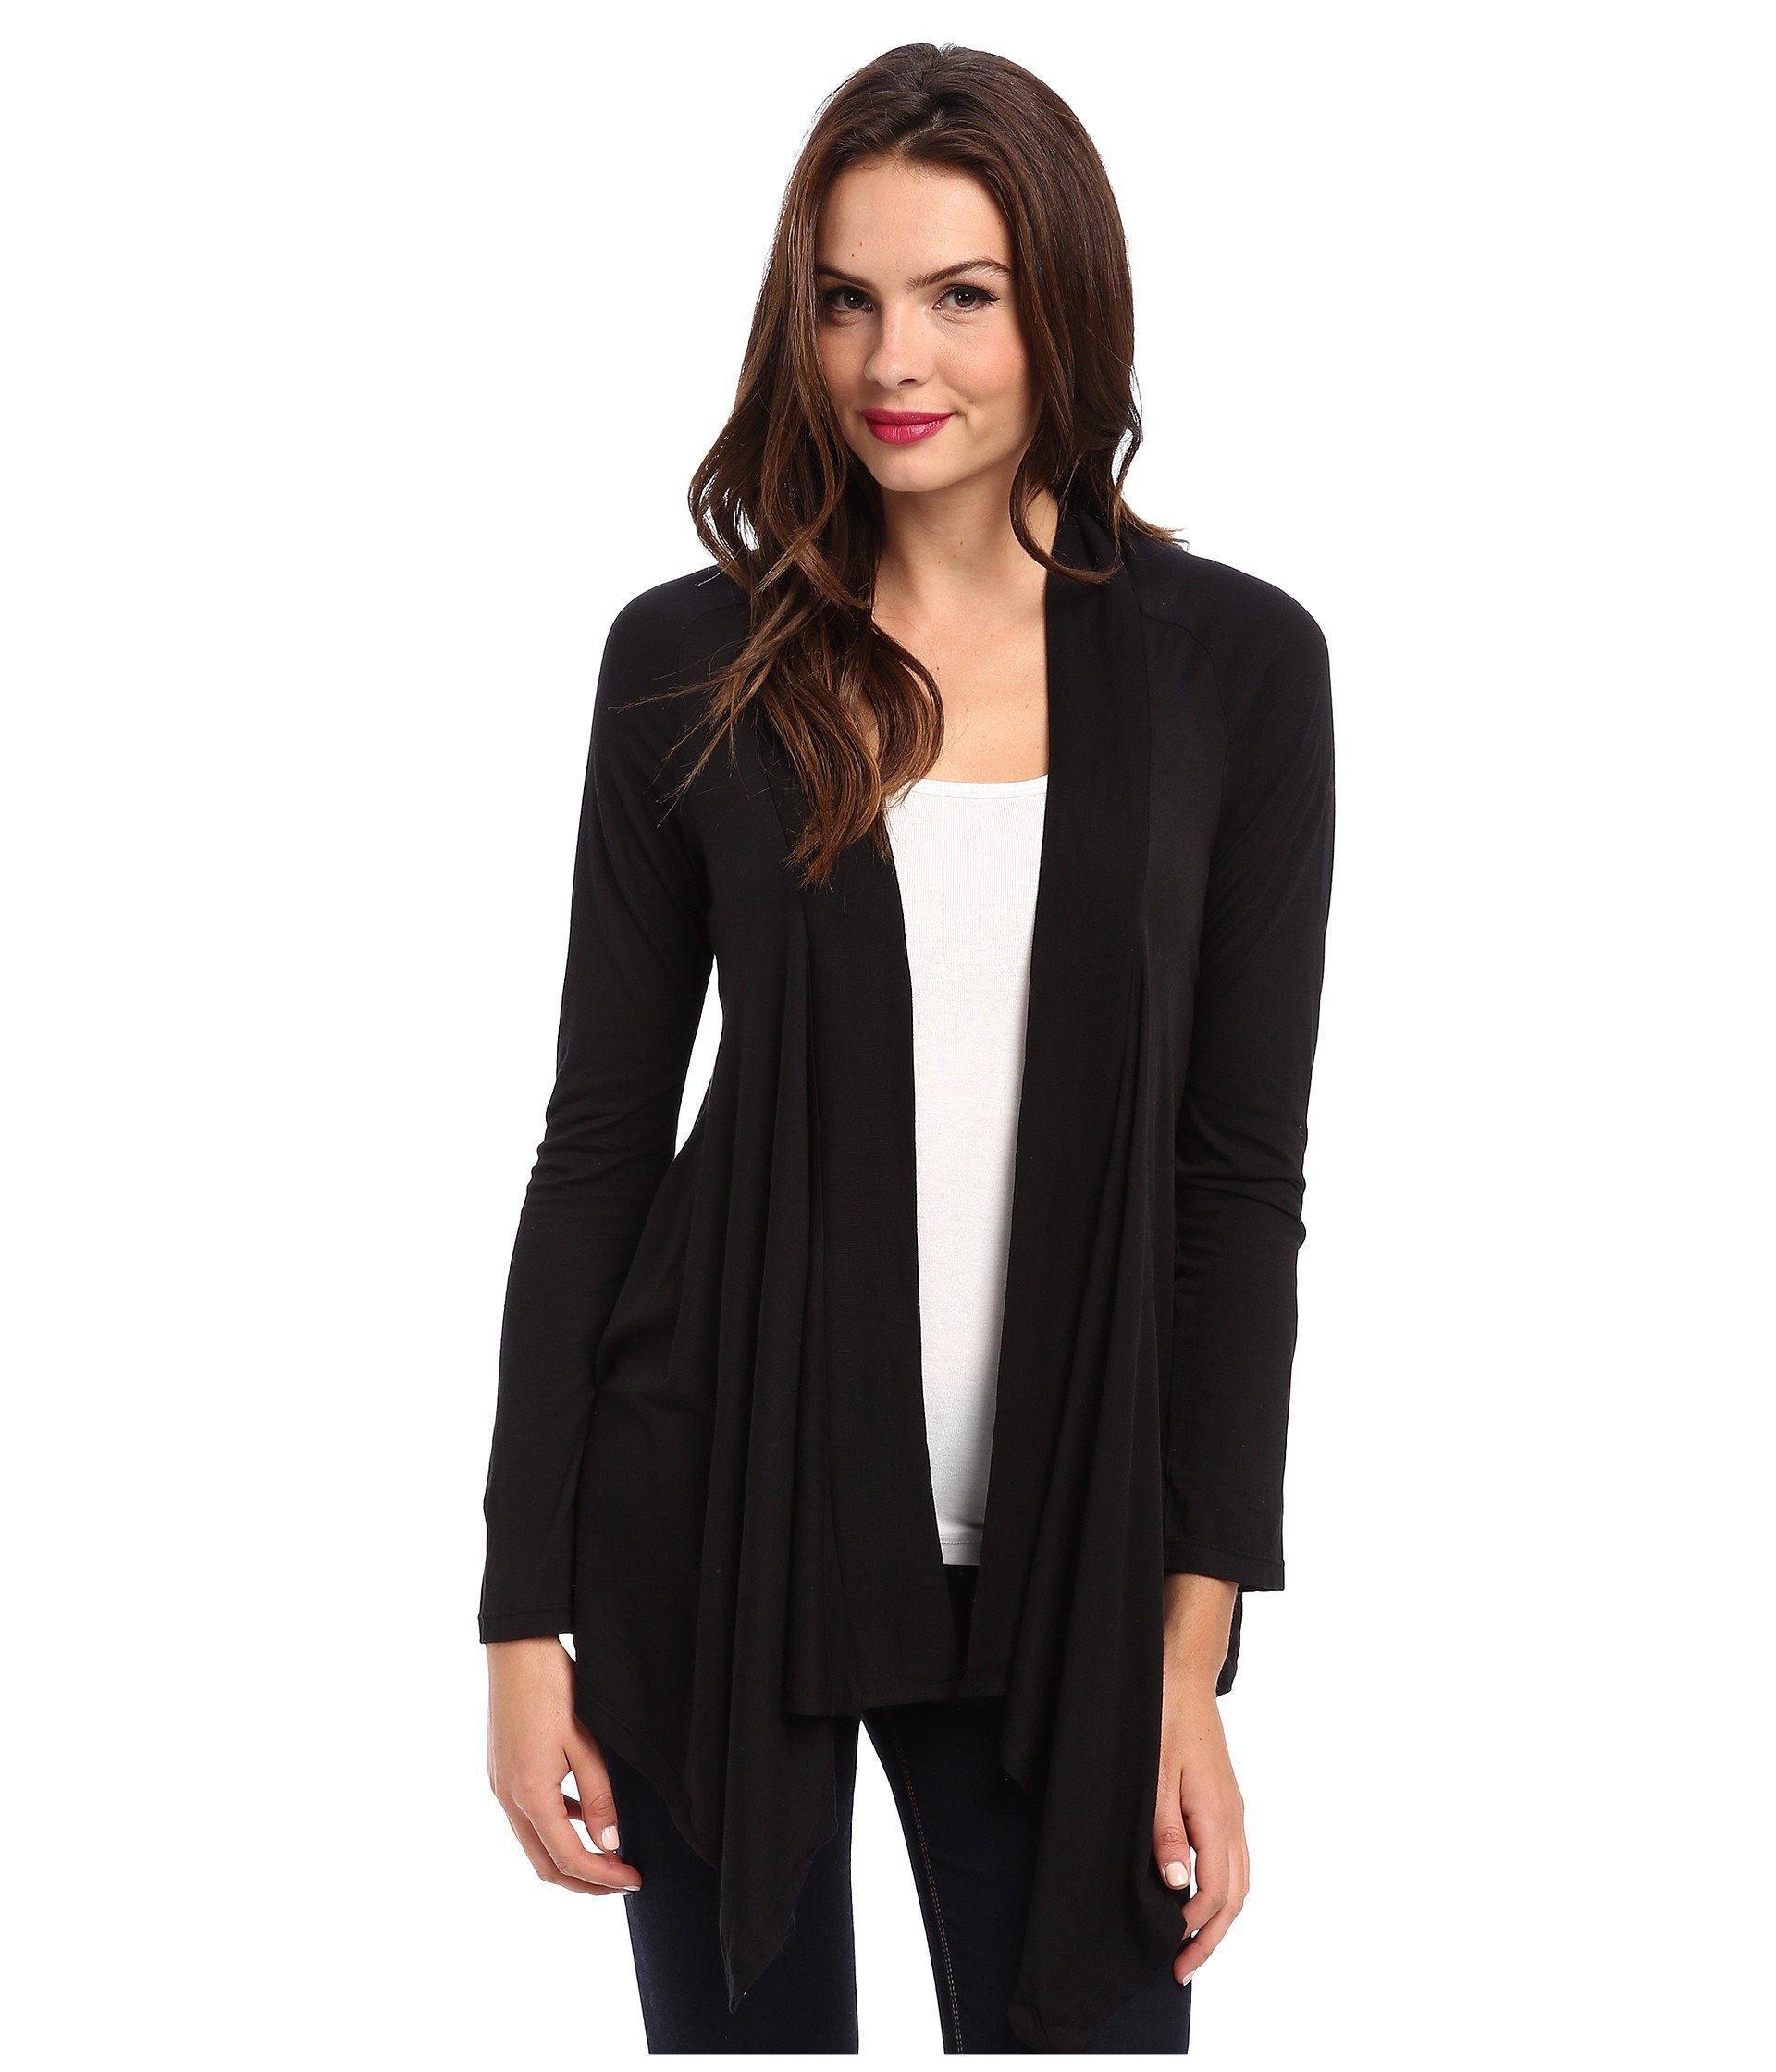 drapes fleece nordstrom product thought cardigan shop threads black rack drape of markesha image